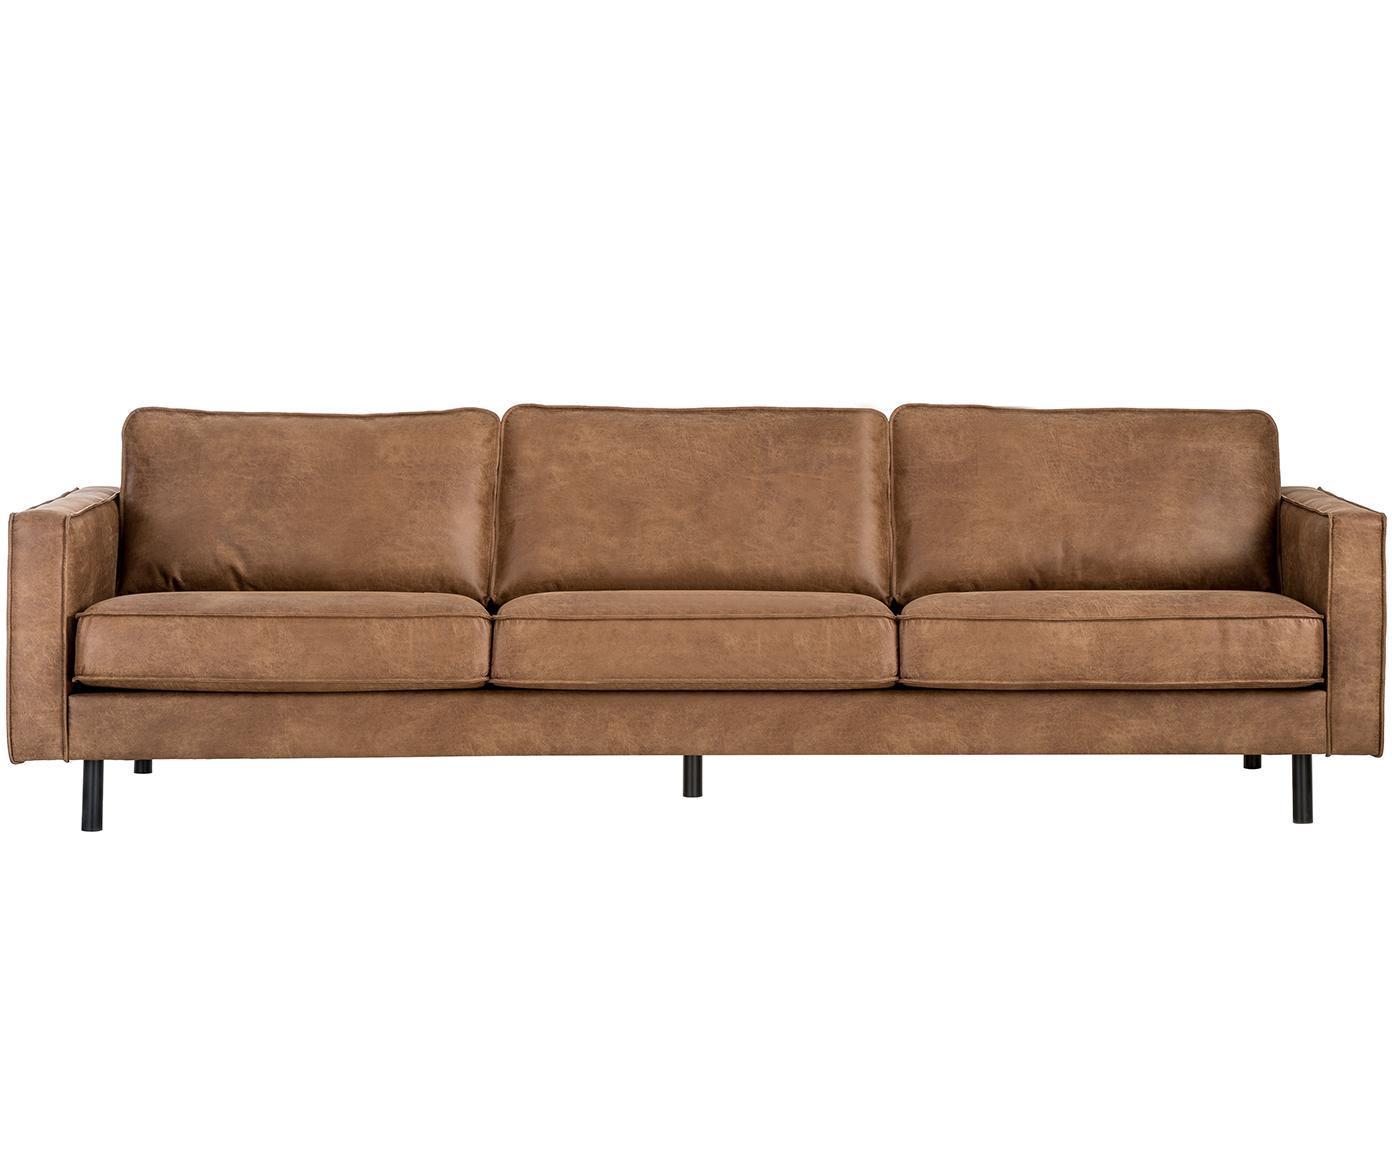 Leder-Sofa Hunter (4-Sitzer), Bezug: 70% recyceltes Leder, 30%, Gestell: Massives Birkenholz und h, Füße: Metall, pulverbeschichtet, Leder Braun, B 264 x T 90 cm